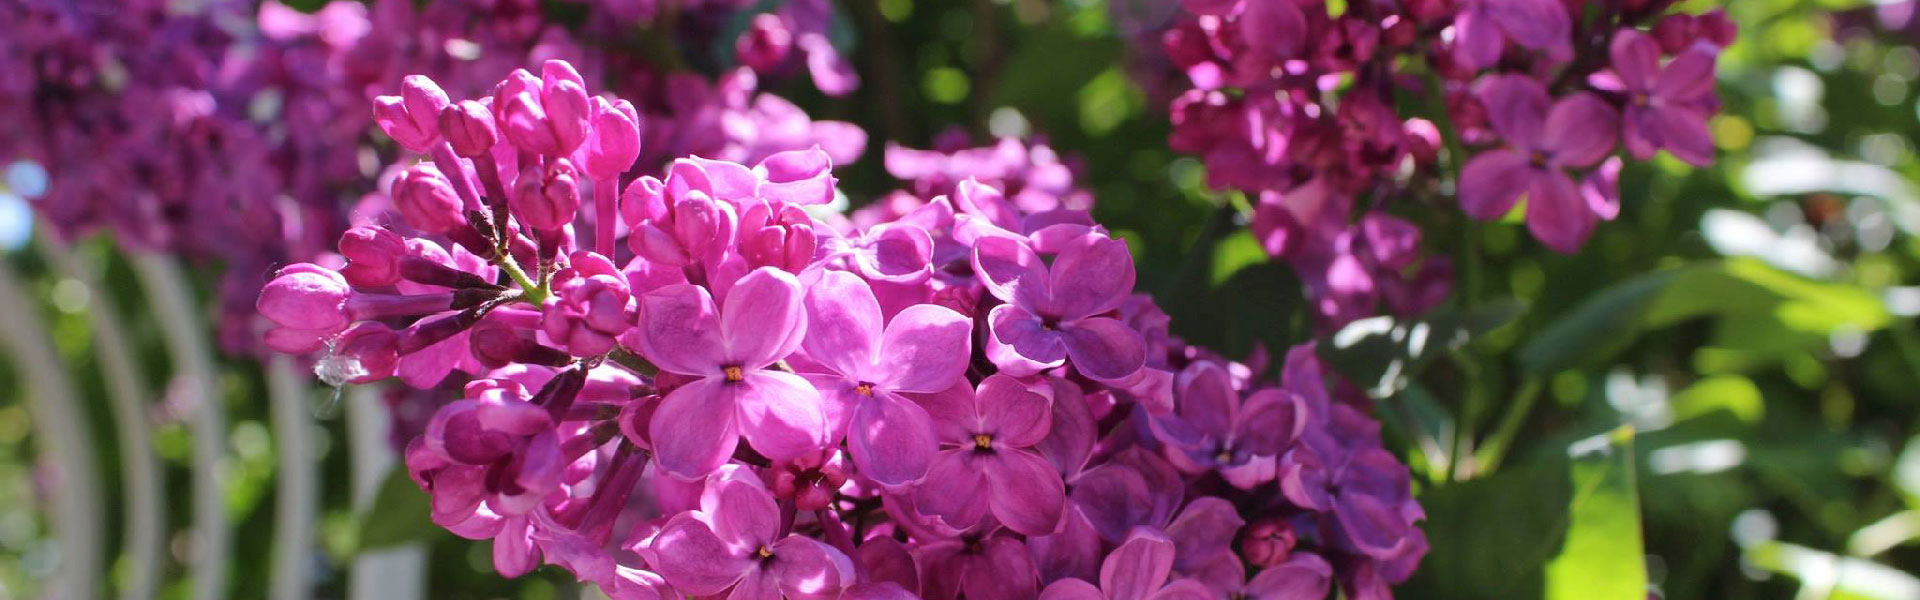 flowers-slide